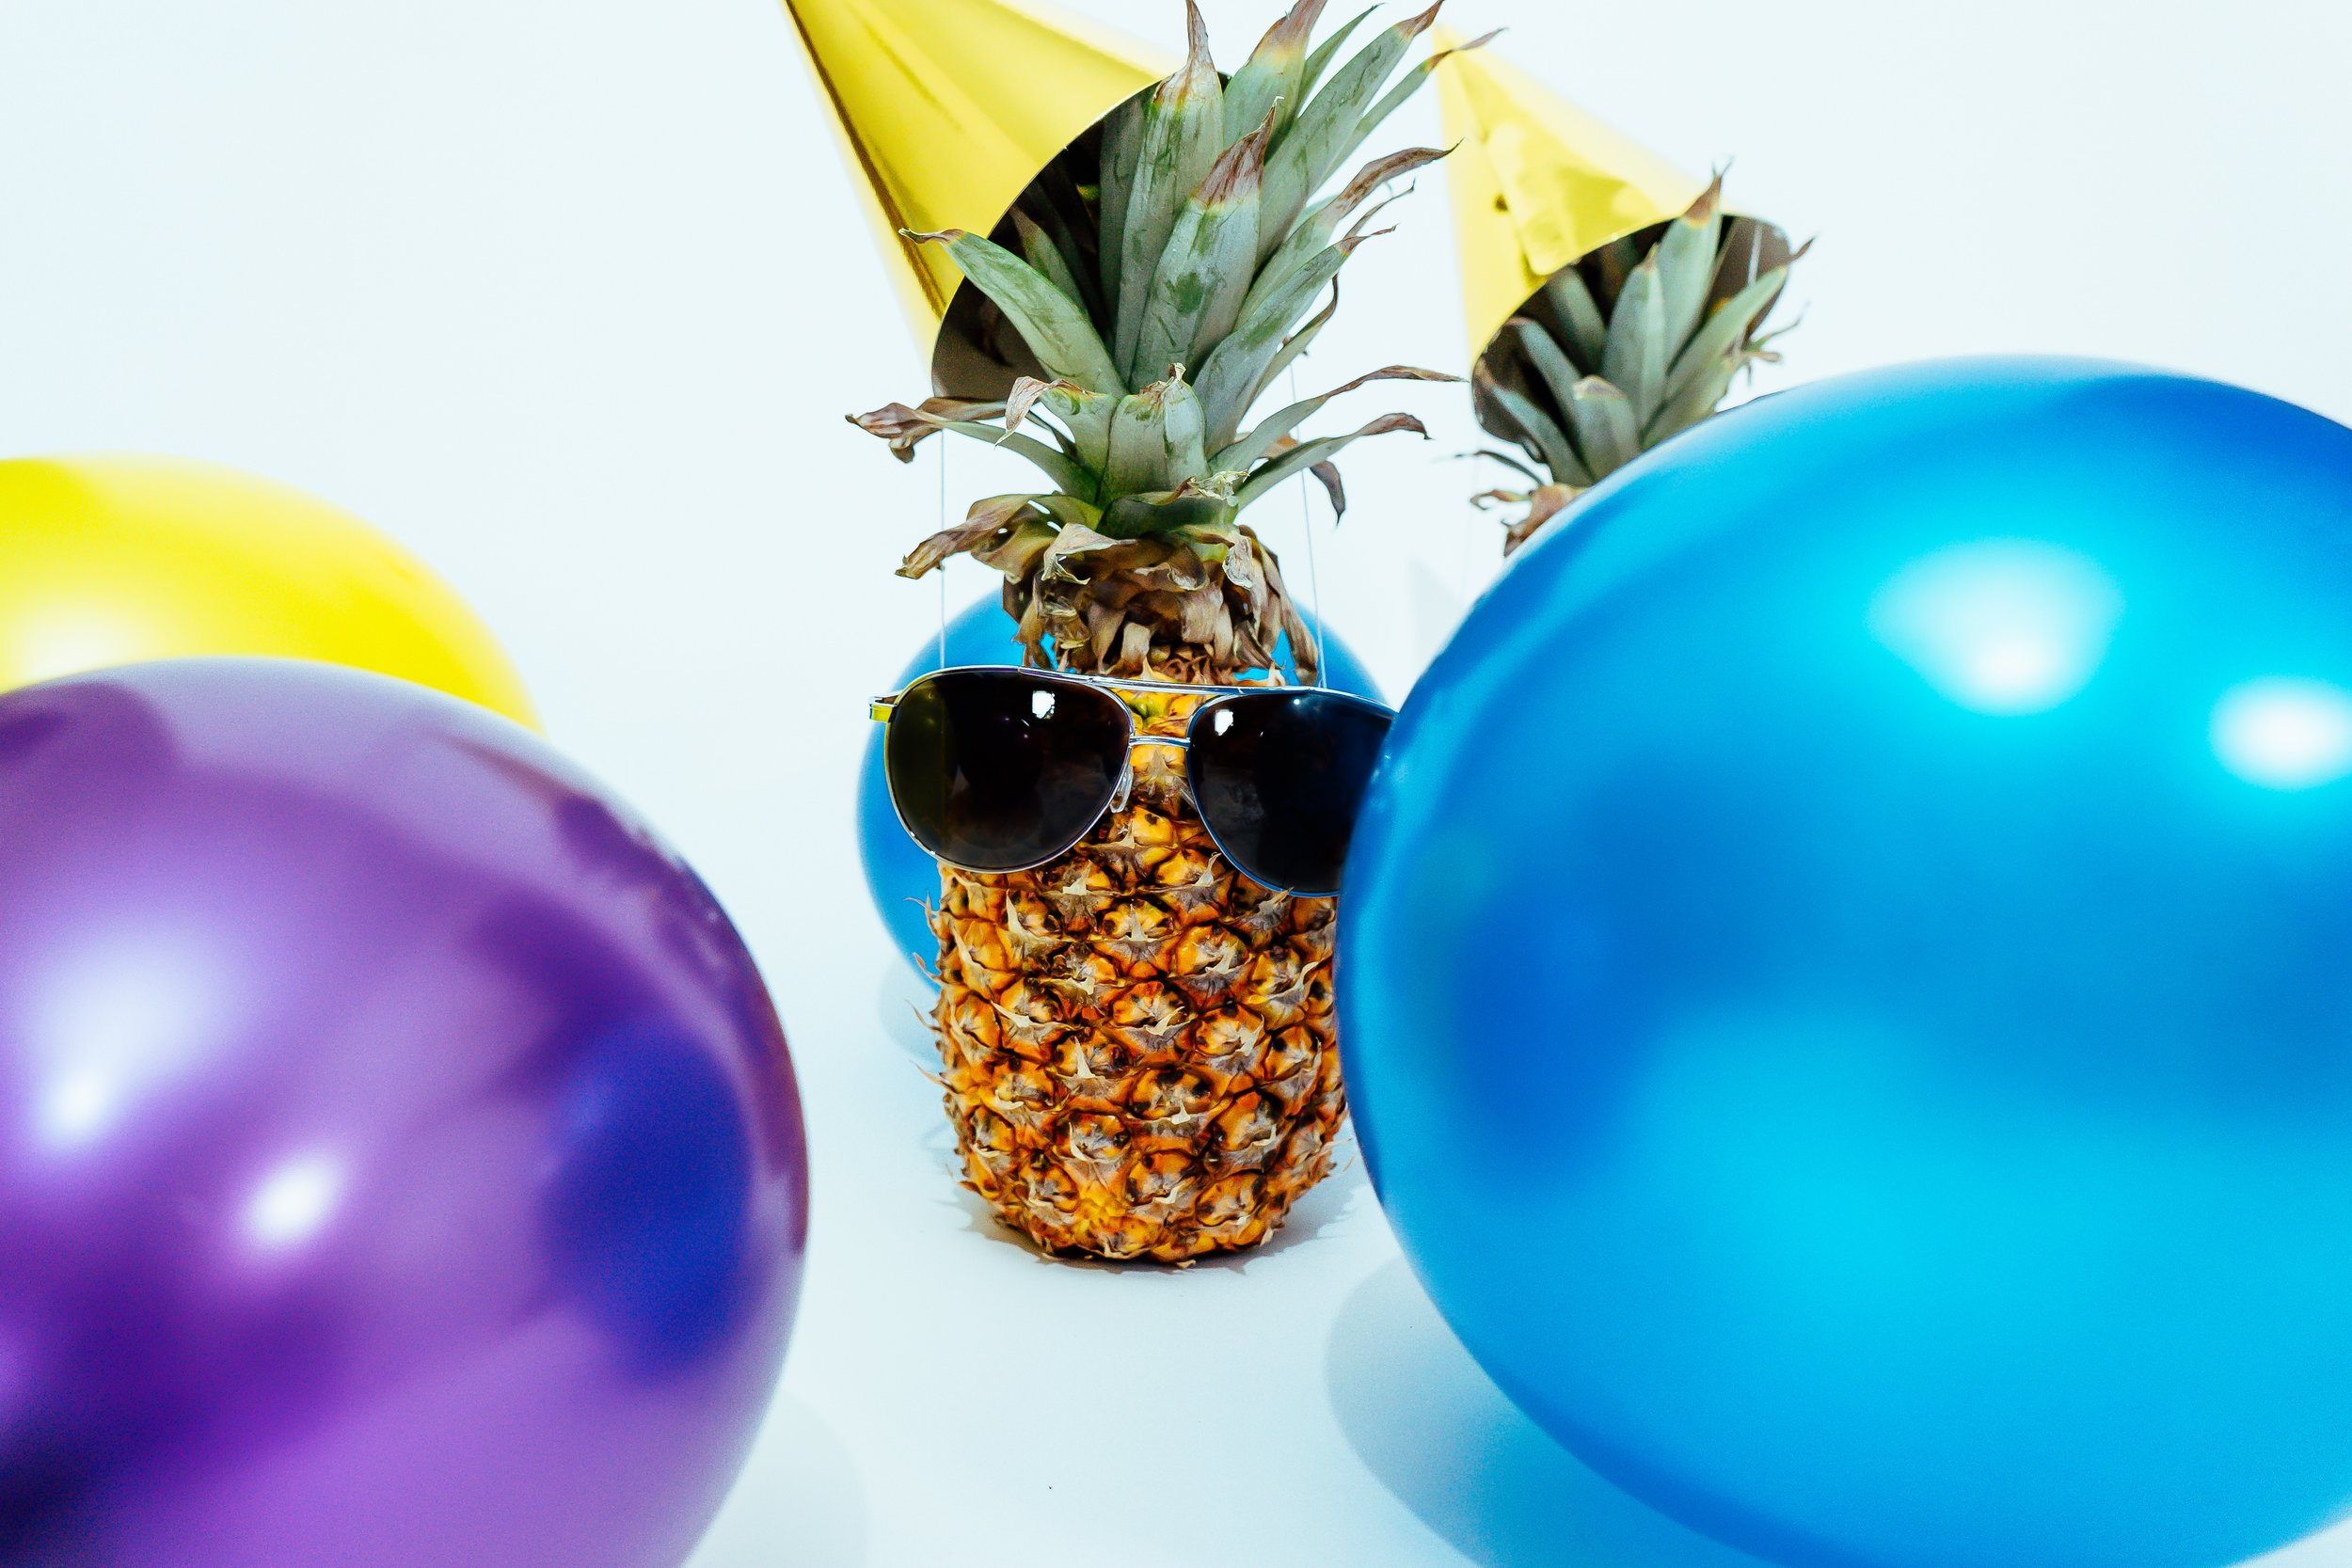 Celebrate Progress - HEALTHY LIVING HABIT #23